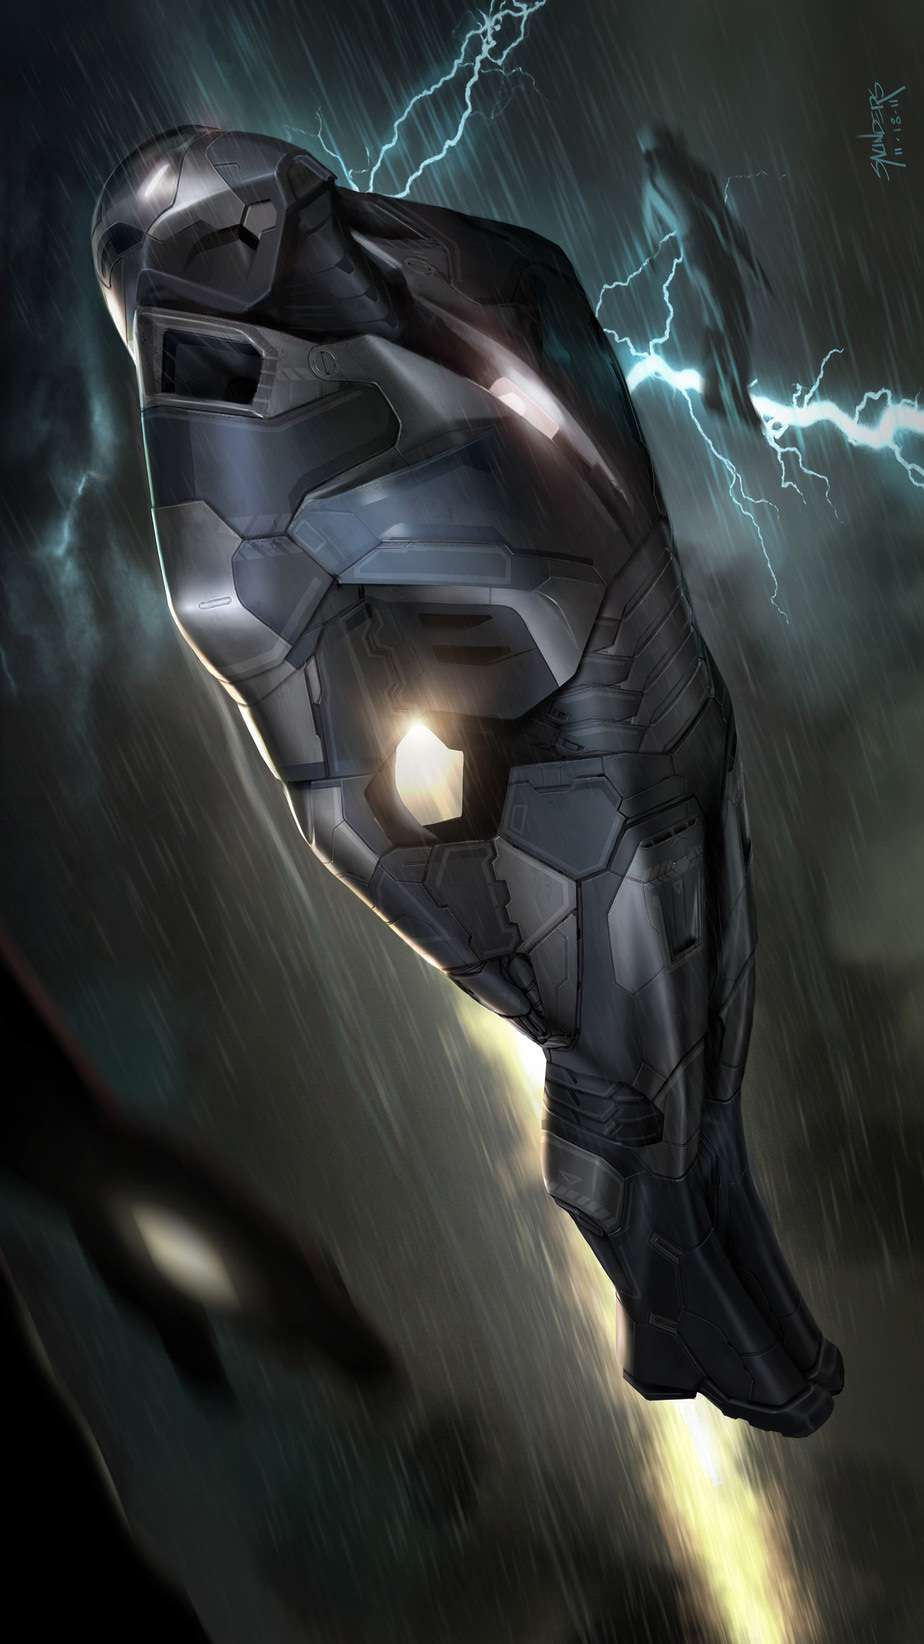 Iron Man Hypervelocity Armor iPhone Wallpaper